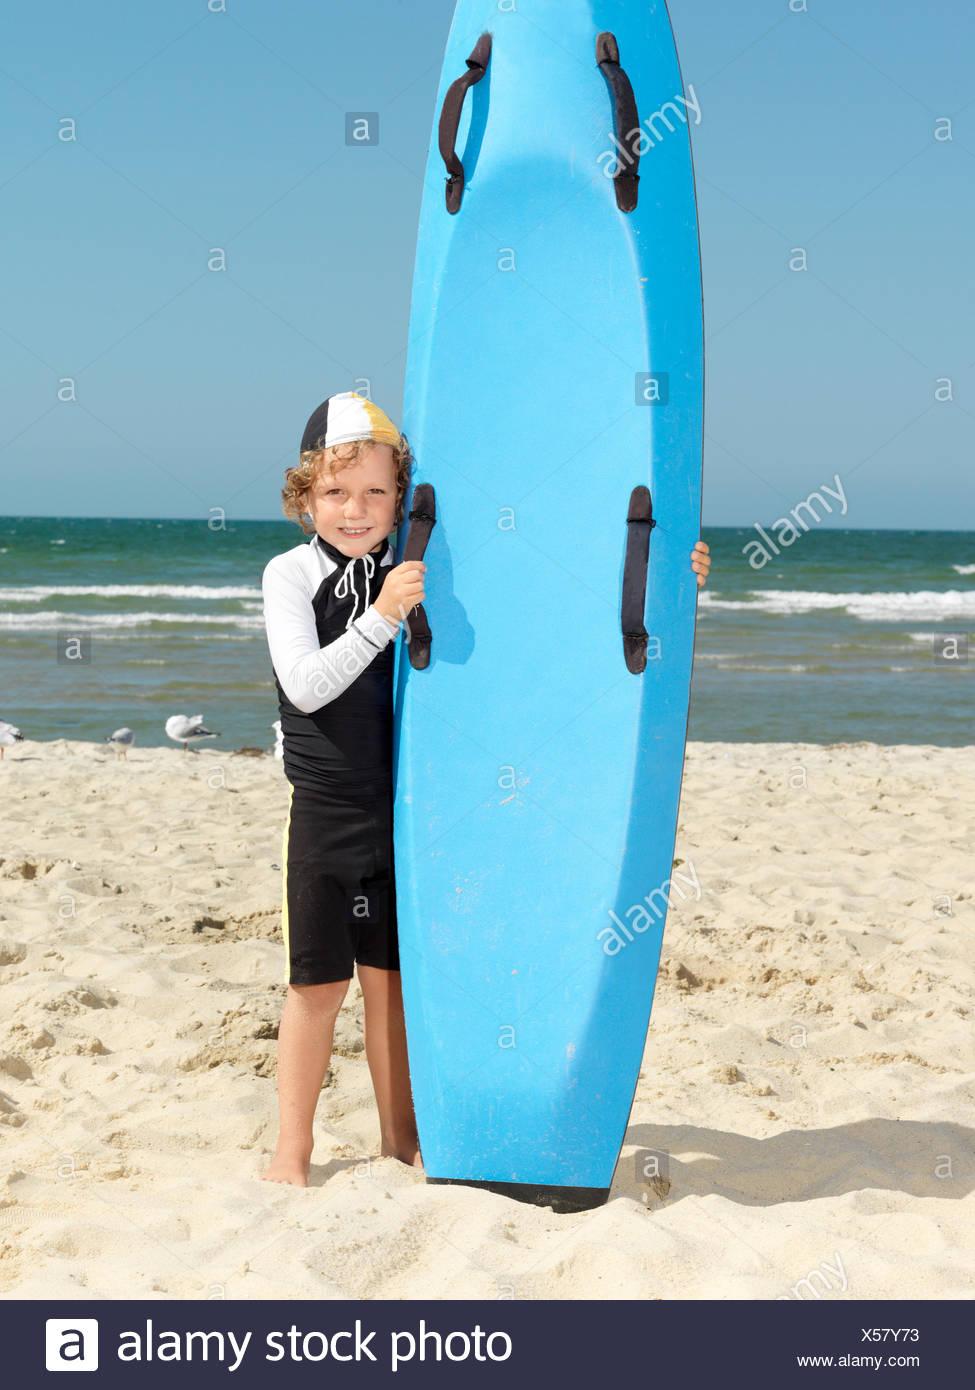 Portrait of cute boy nipper (child surf life savers) next to surfboard at beach, Altona, Melbourne, Australia - Stock Image